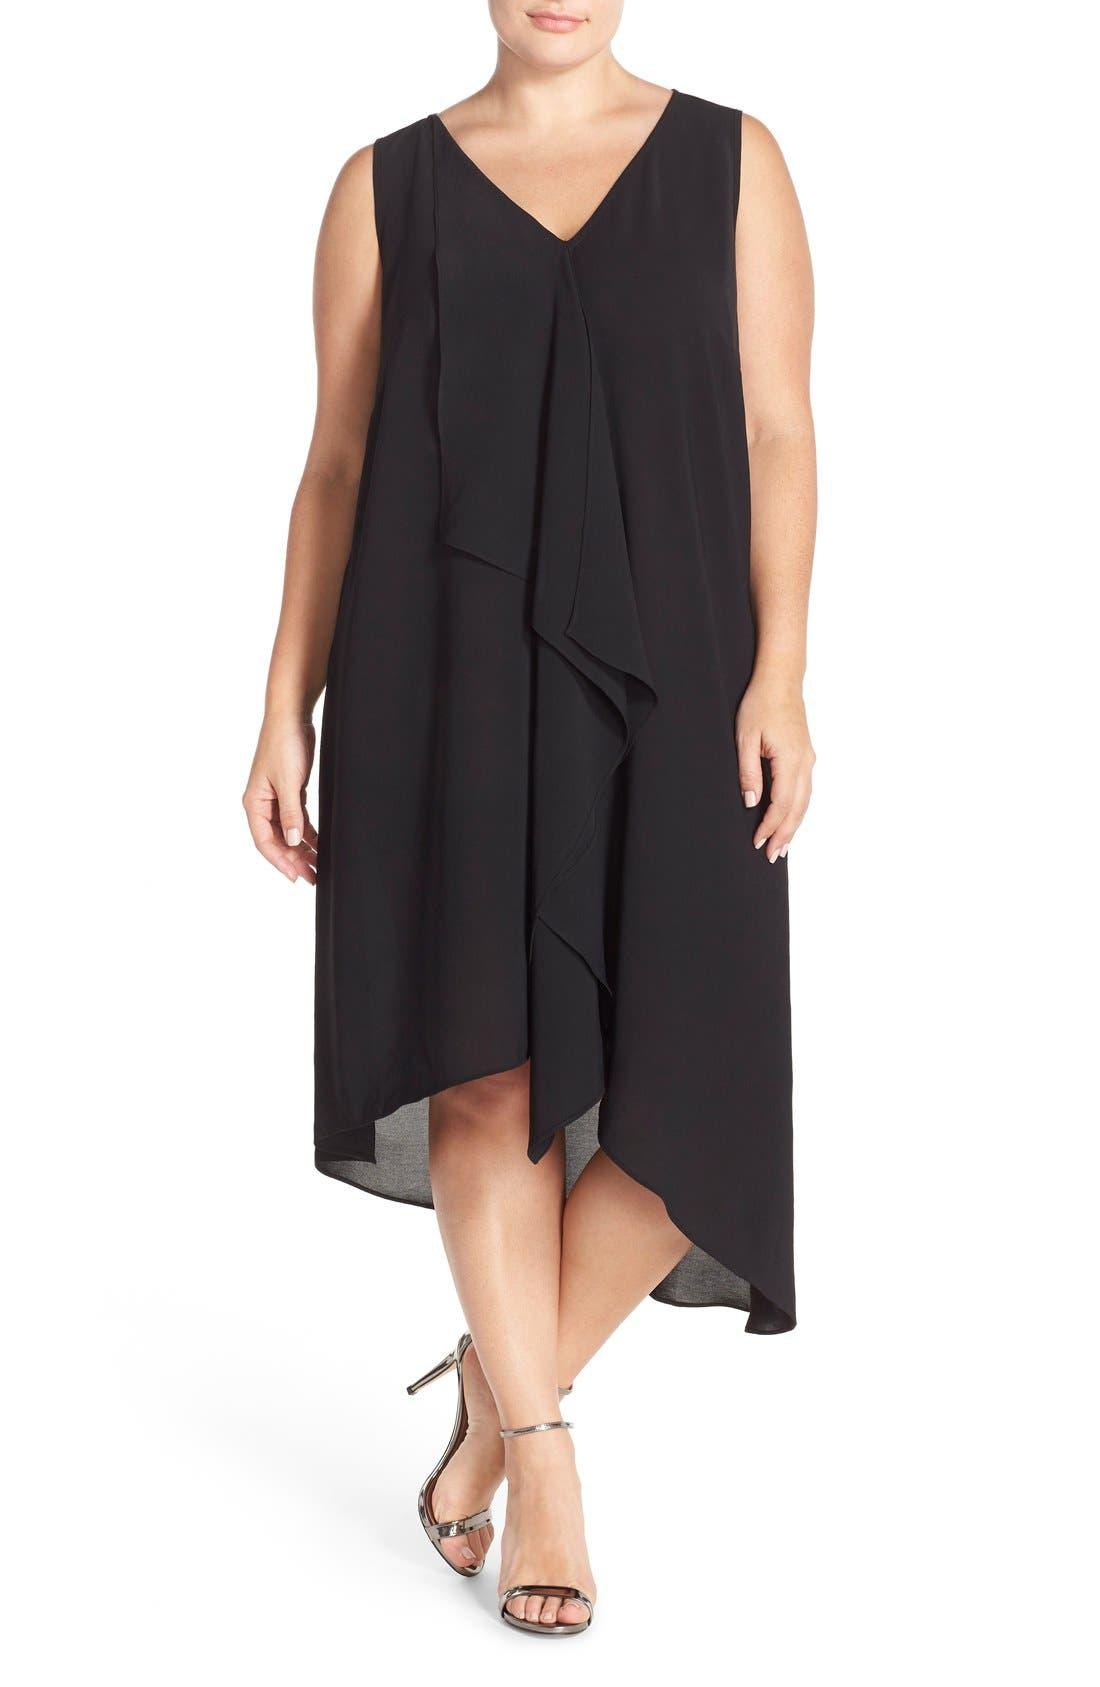 Alternate Image 1 Selected - Adrianna Papell Sleeveless Asymmetrical Front Drape Crepe Shift Dress (Plus Size)